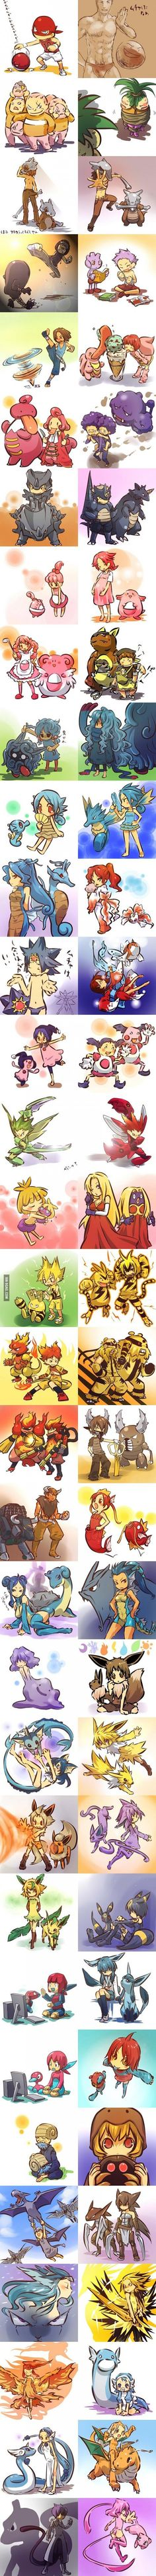 If pokemon were humans part II. Left Jotto